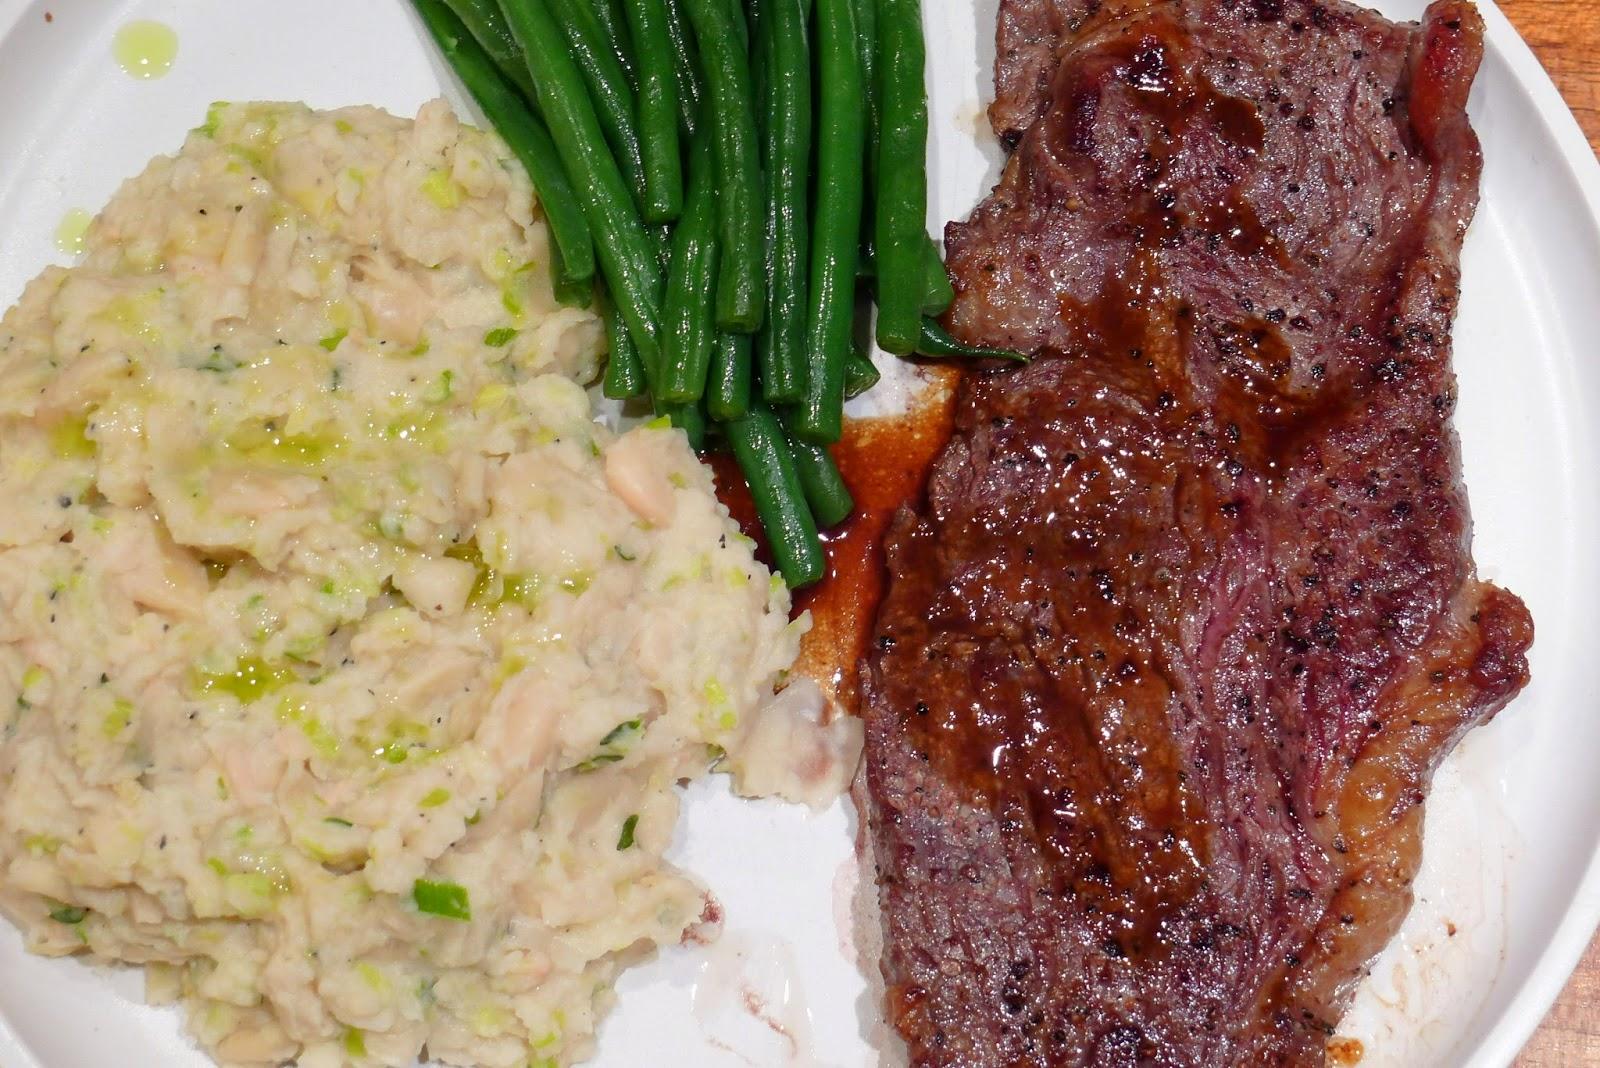 ... Adventures in London: Sirloin Steak with White Bean & Leek Mash